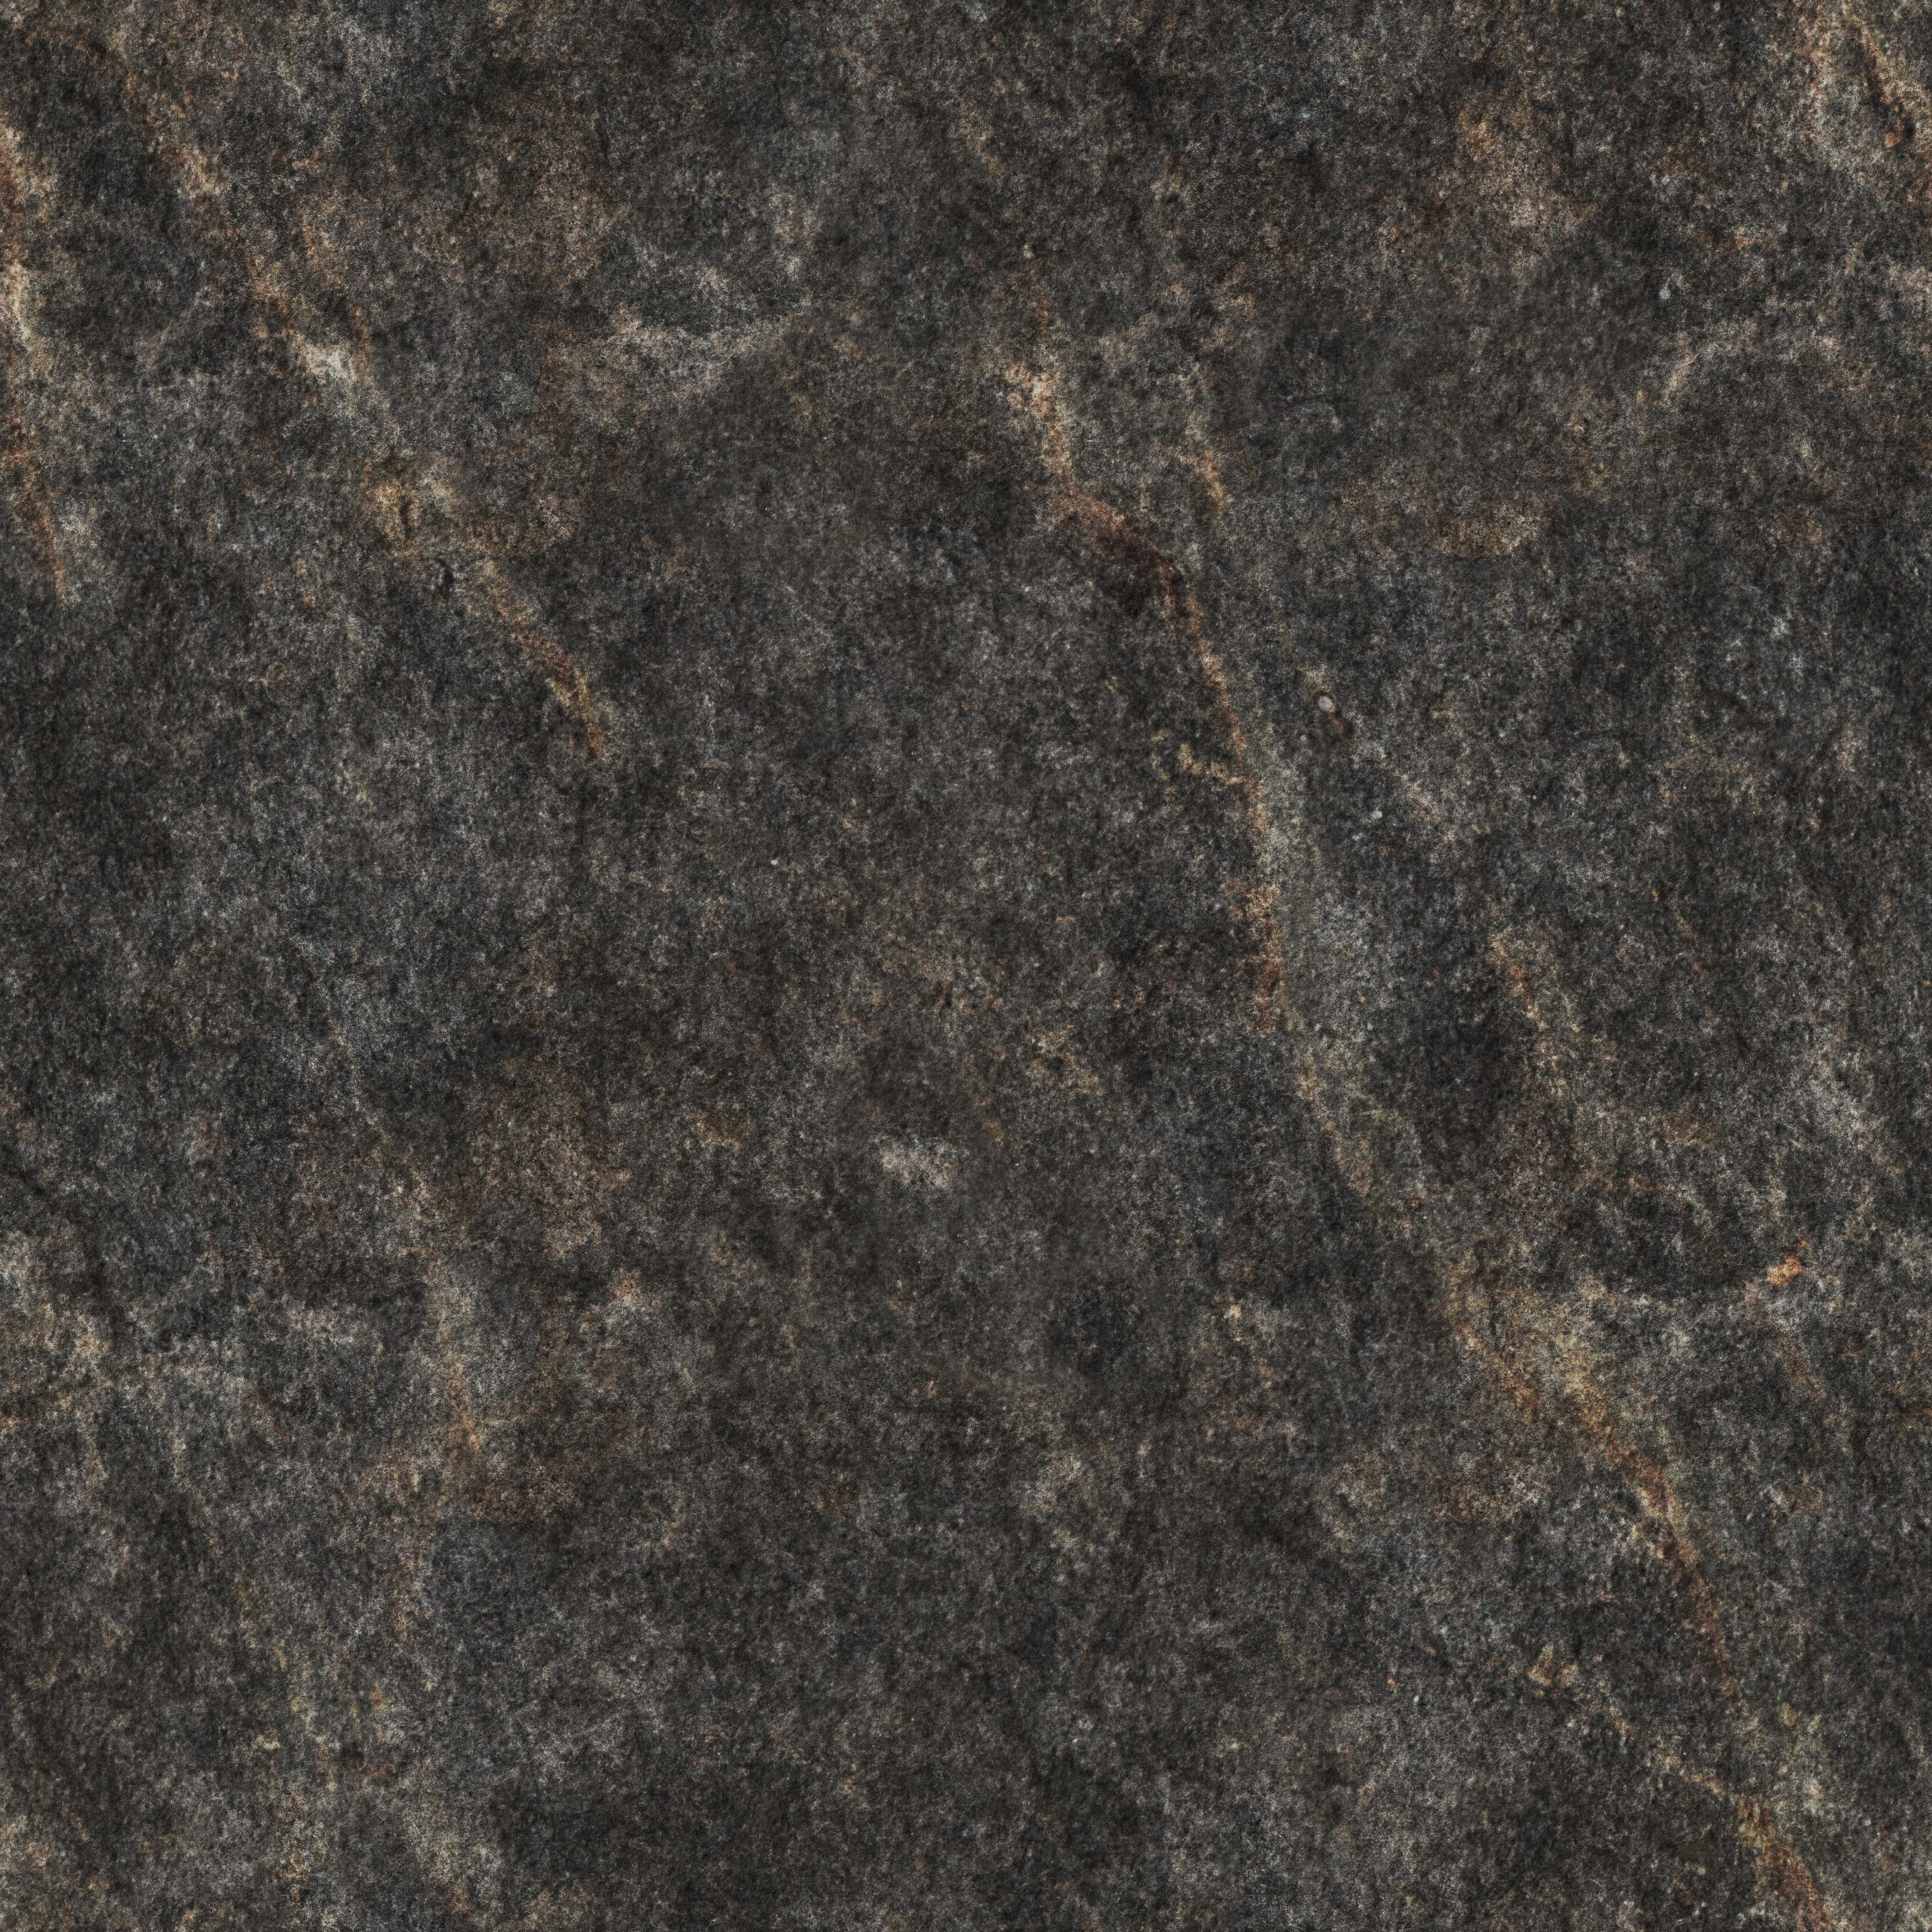 Stone Texture (4k) by ReconditeArcana on DeviantArt Seamless Moss Rock Texture